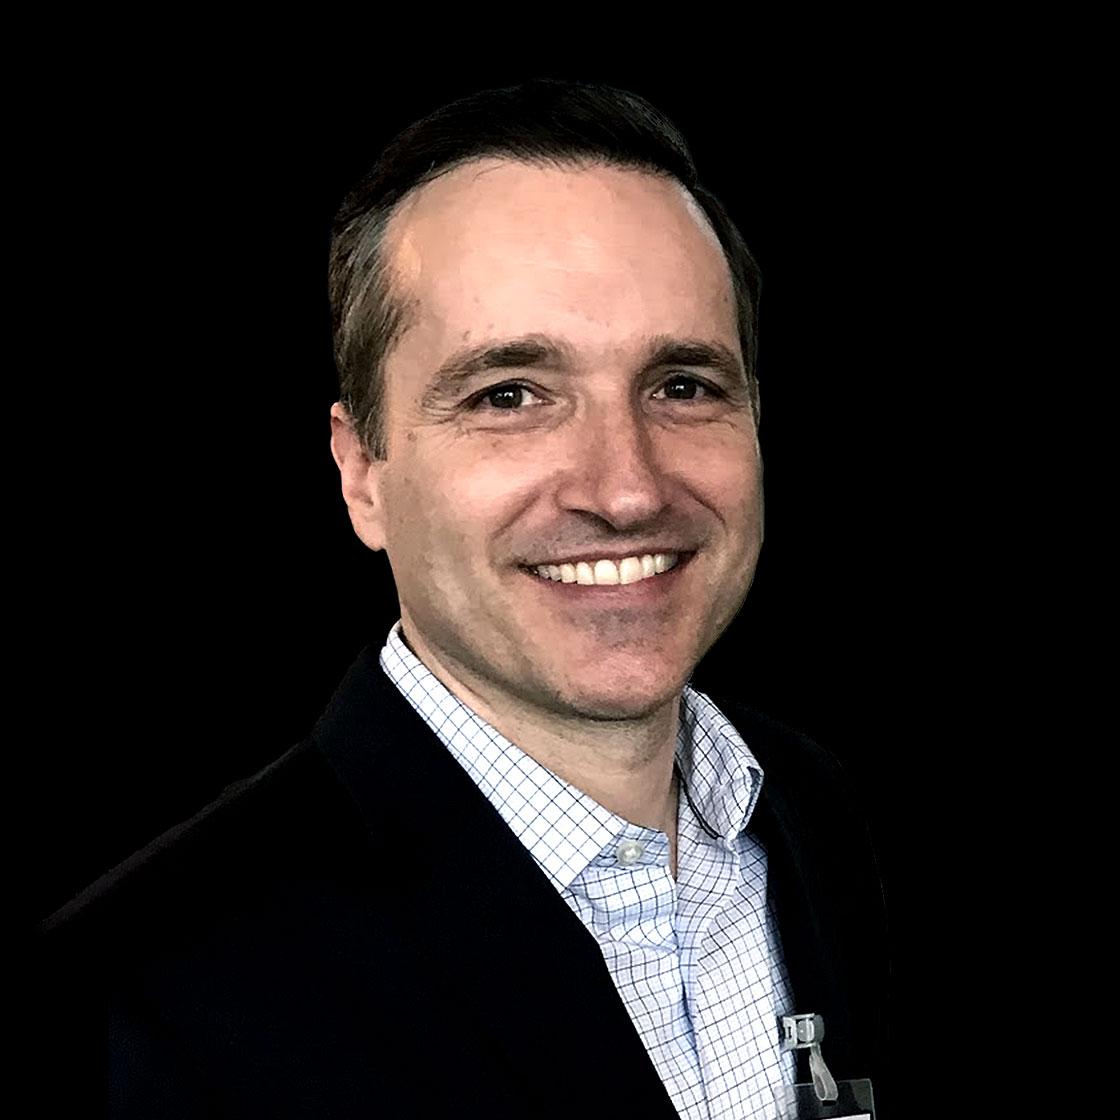 Denis Grosz